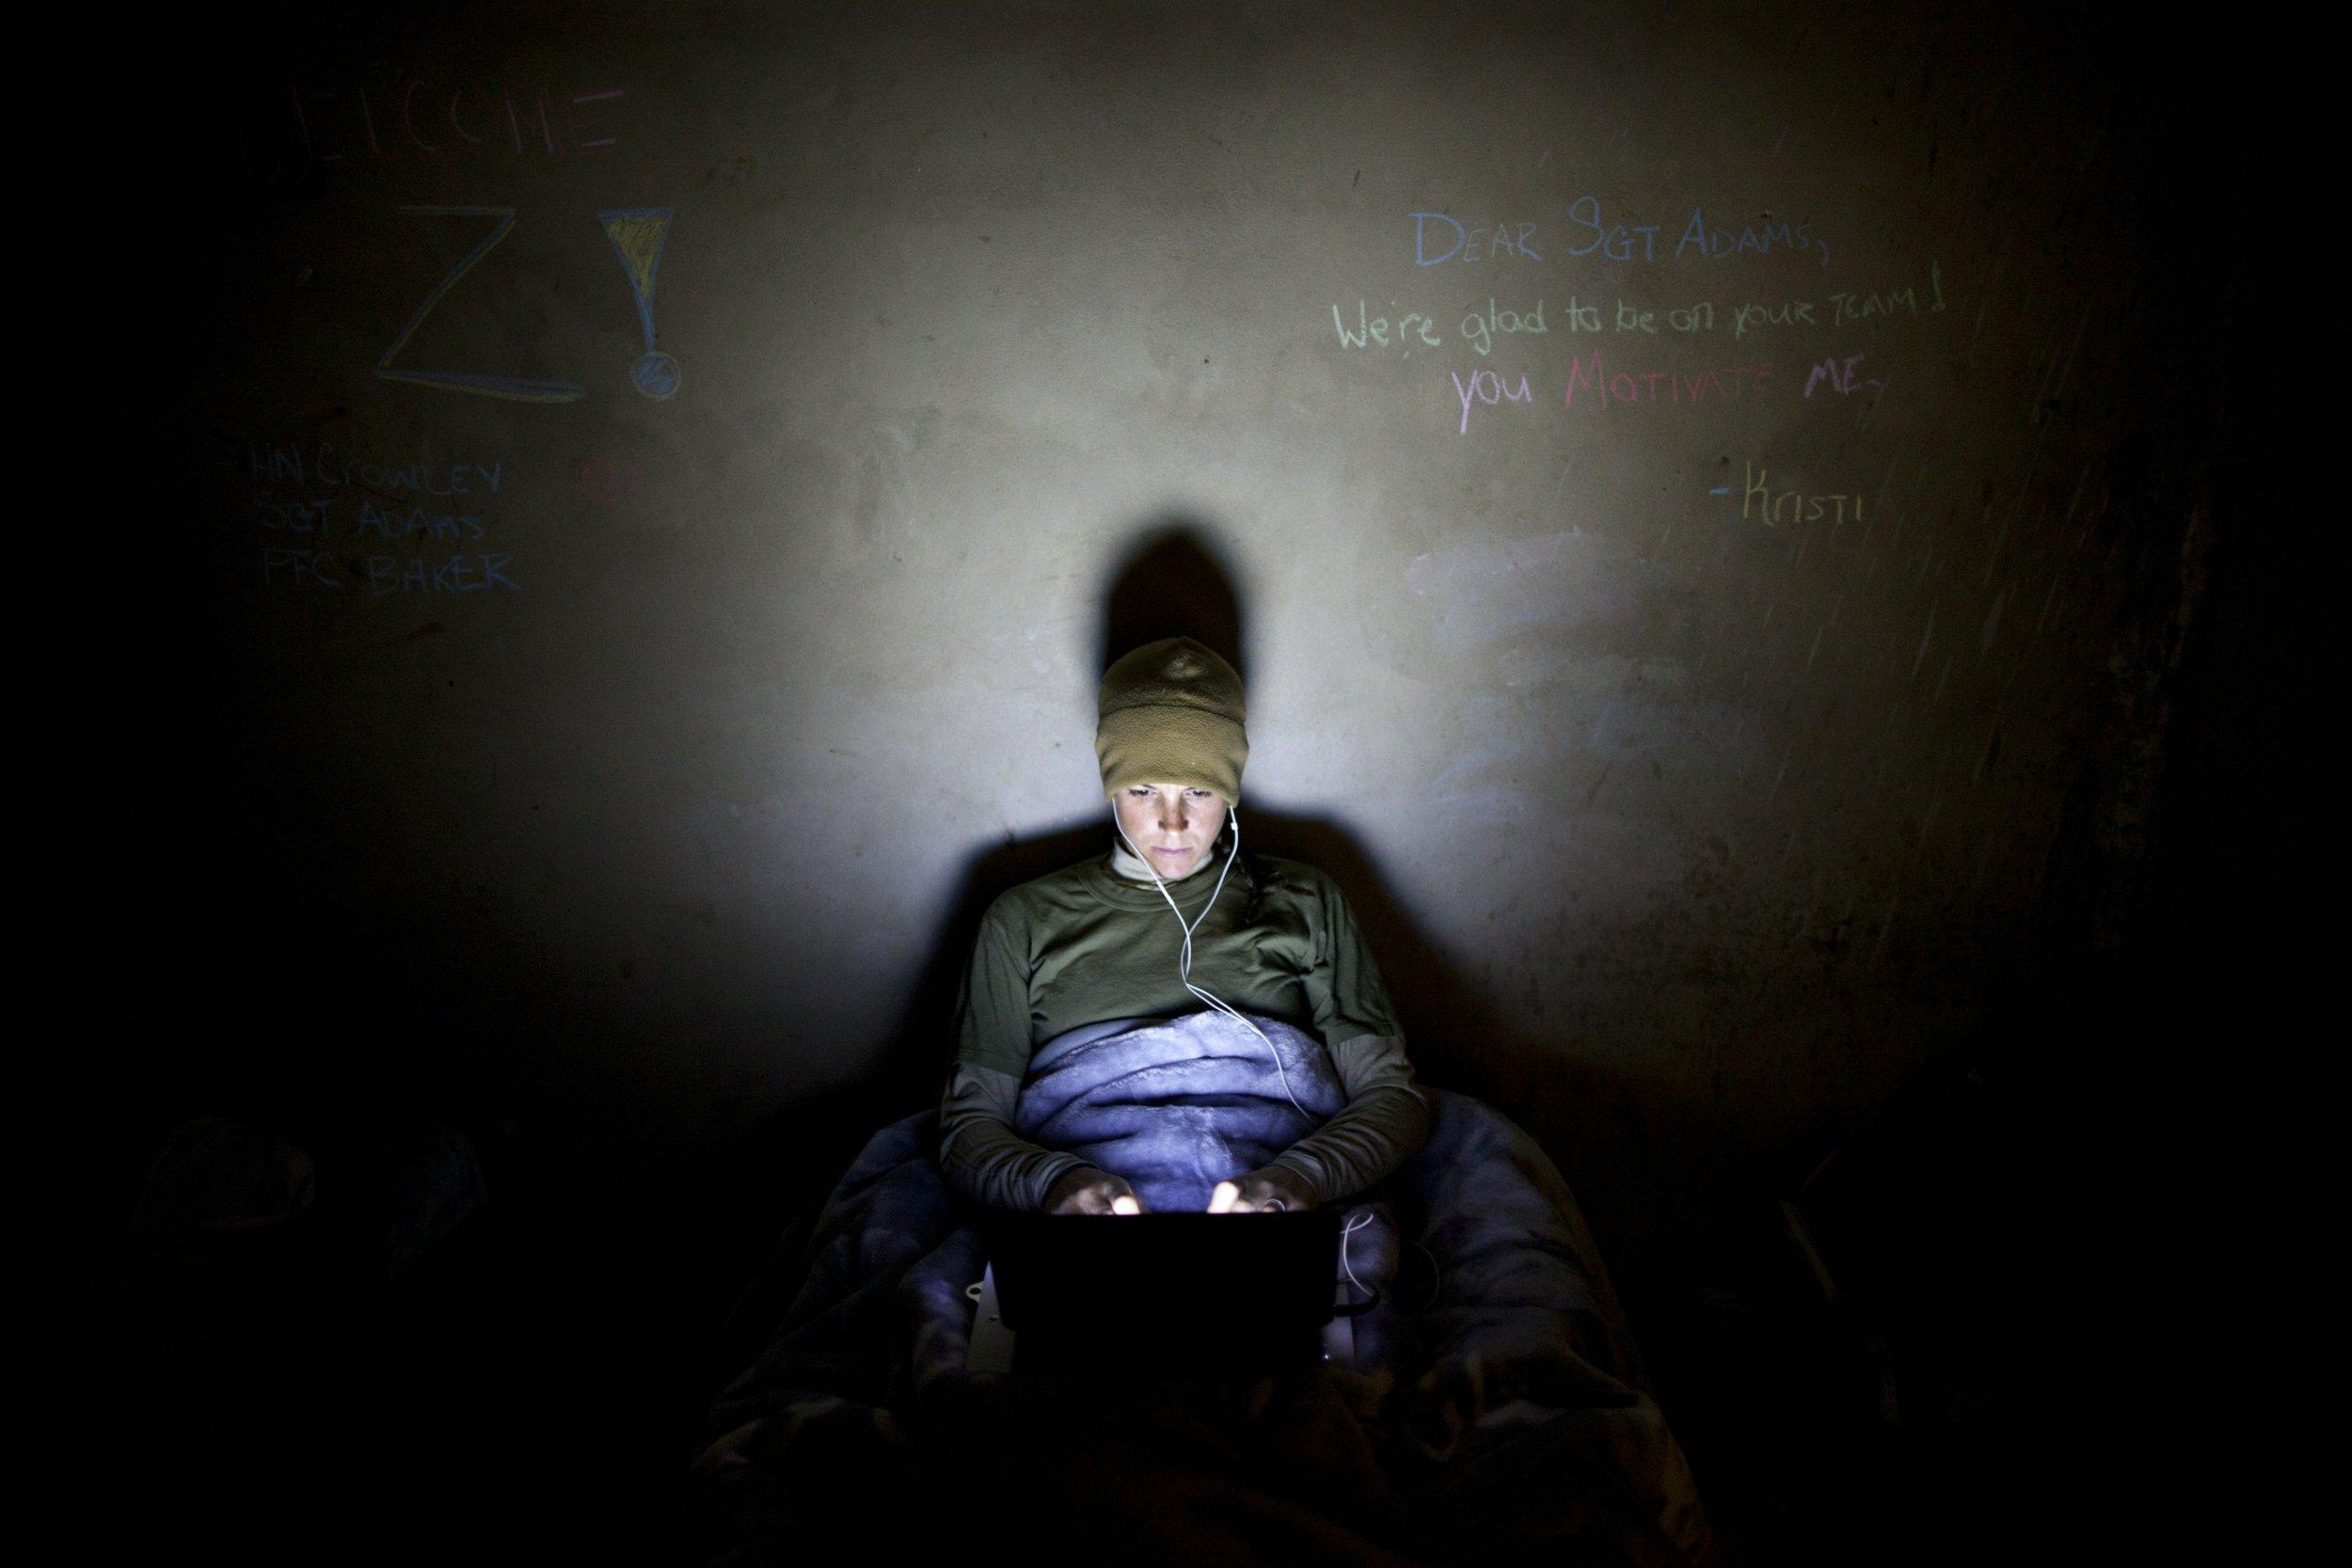 US Marines email leak exposes secrets of 21,000 soldiers, civilians, officials confirm